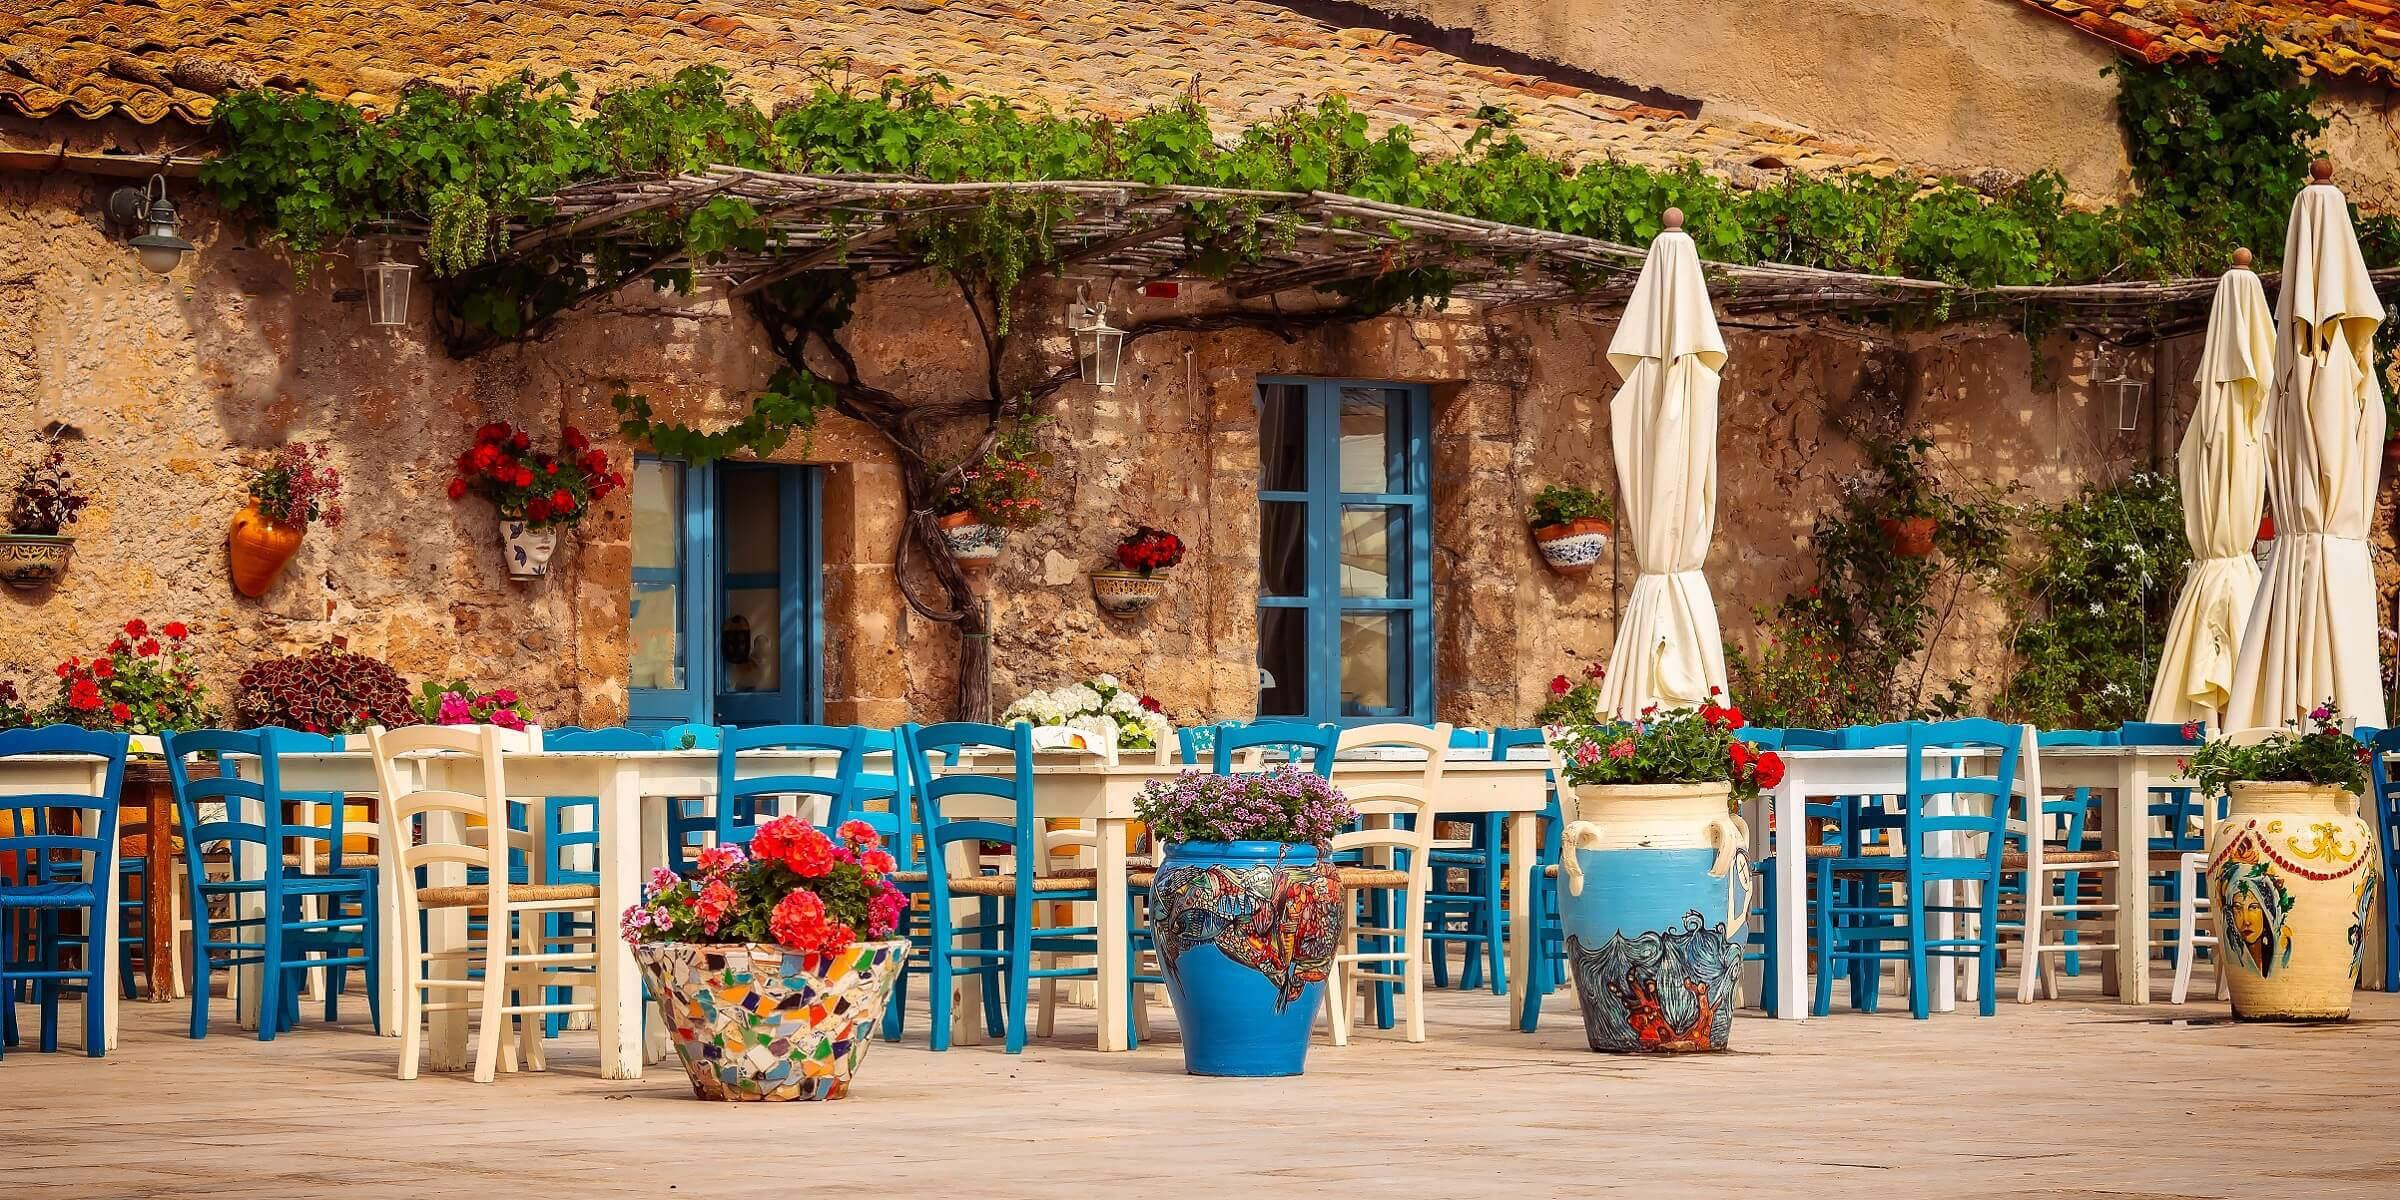 Taverne auf Zypern